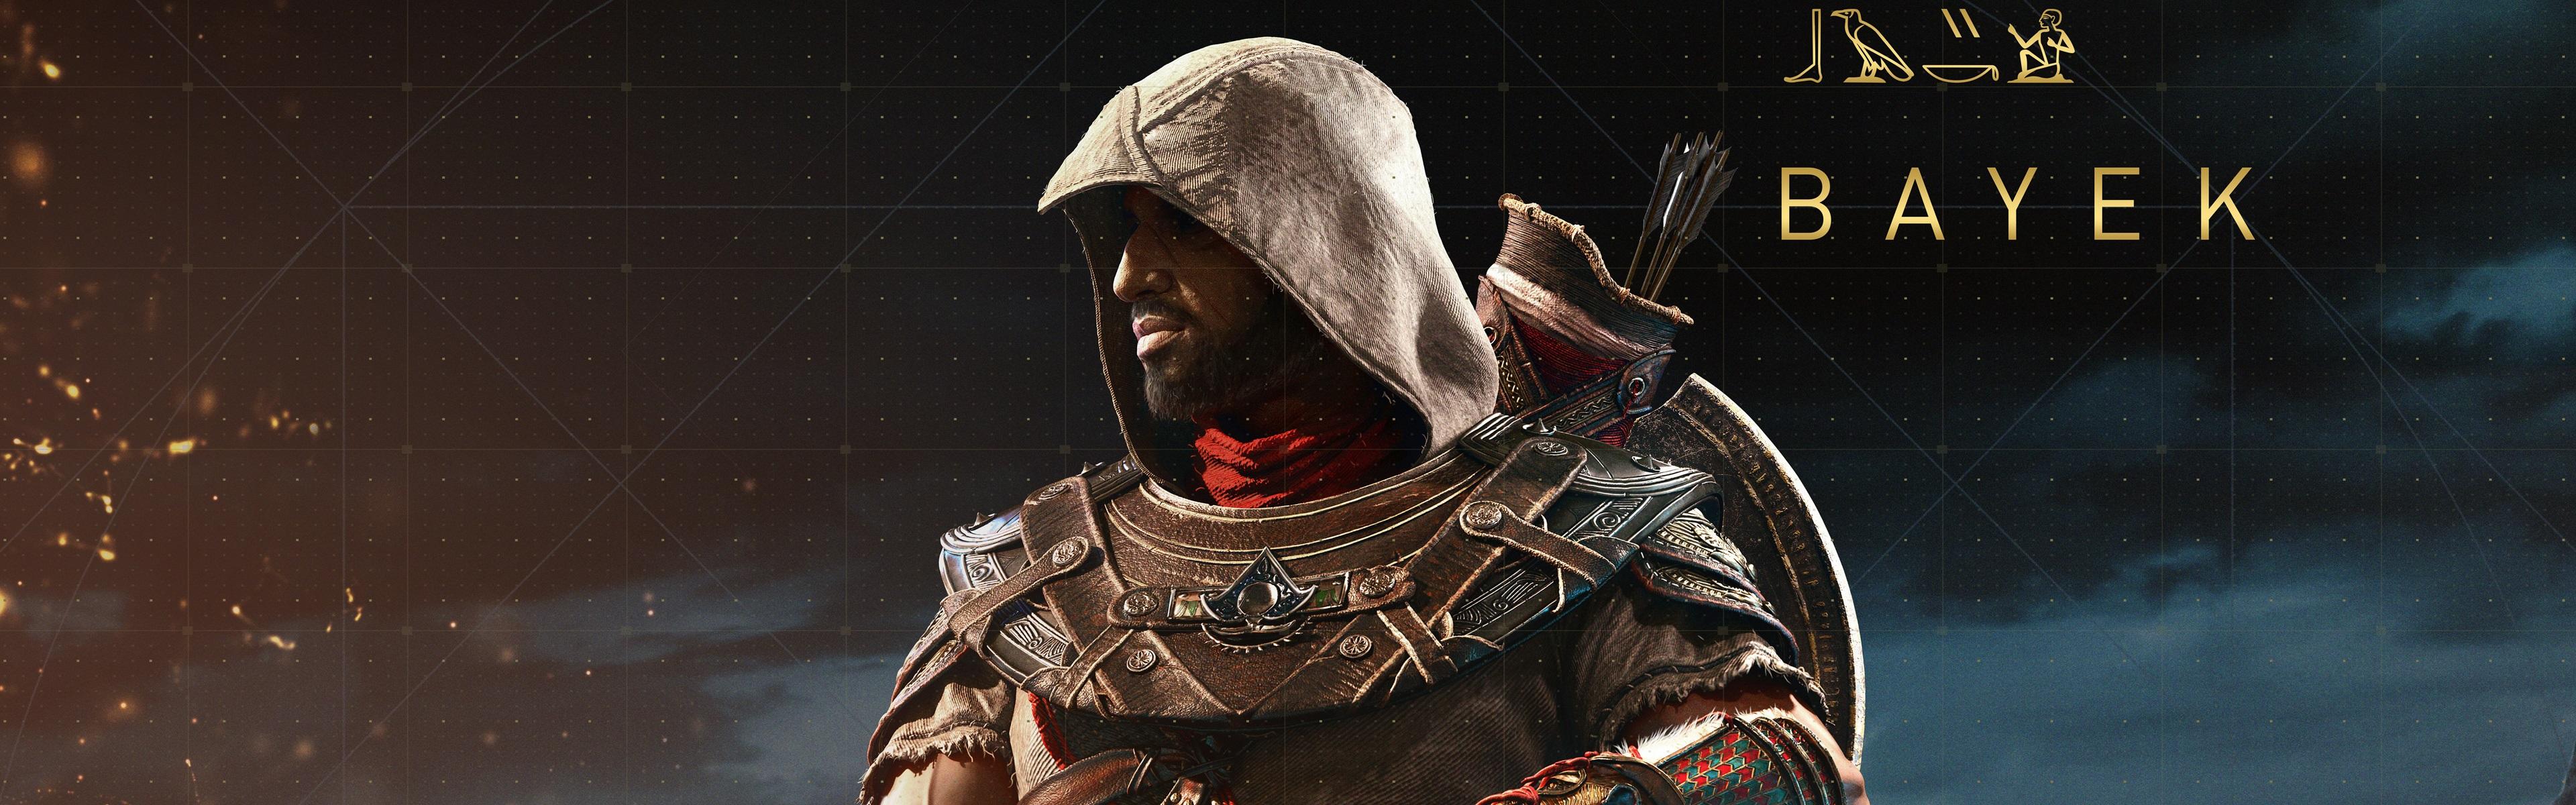 Bayek Assassin S Creed Origins 1080x1920 Iphone 8 7 6 6s Plus